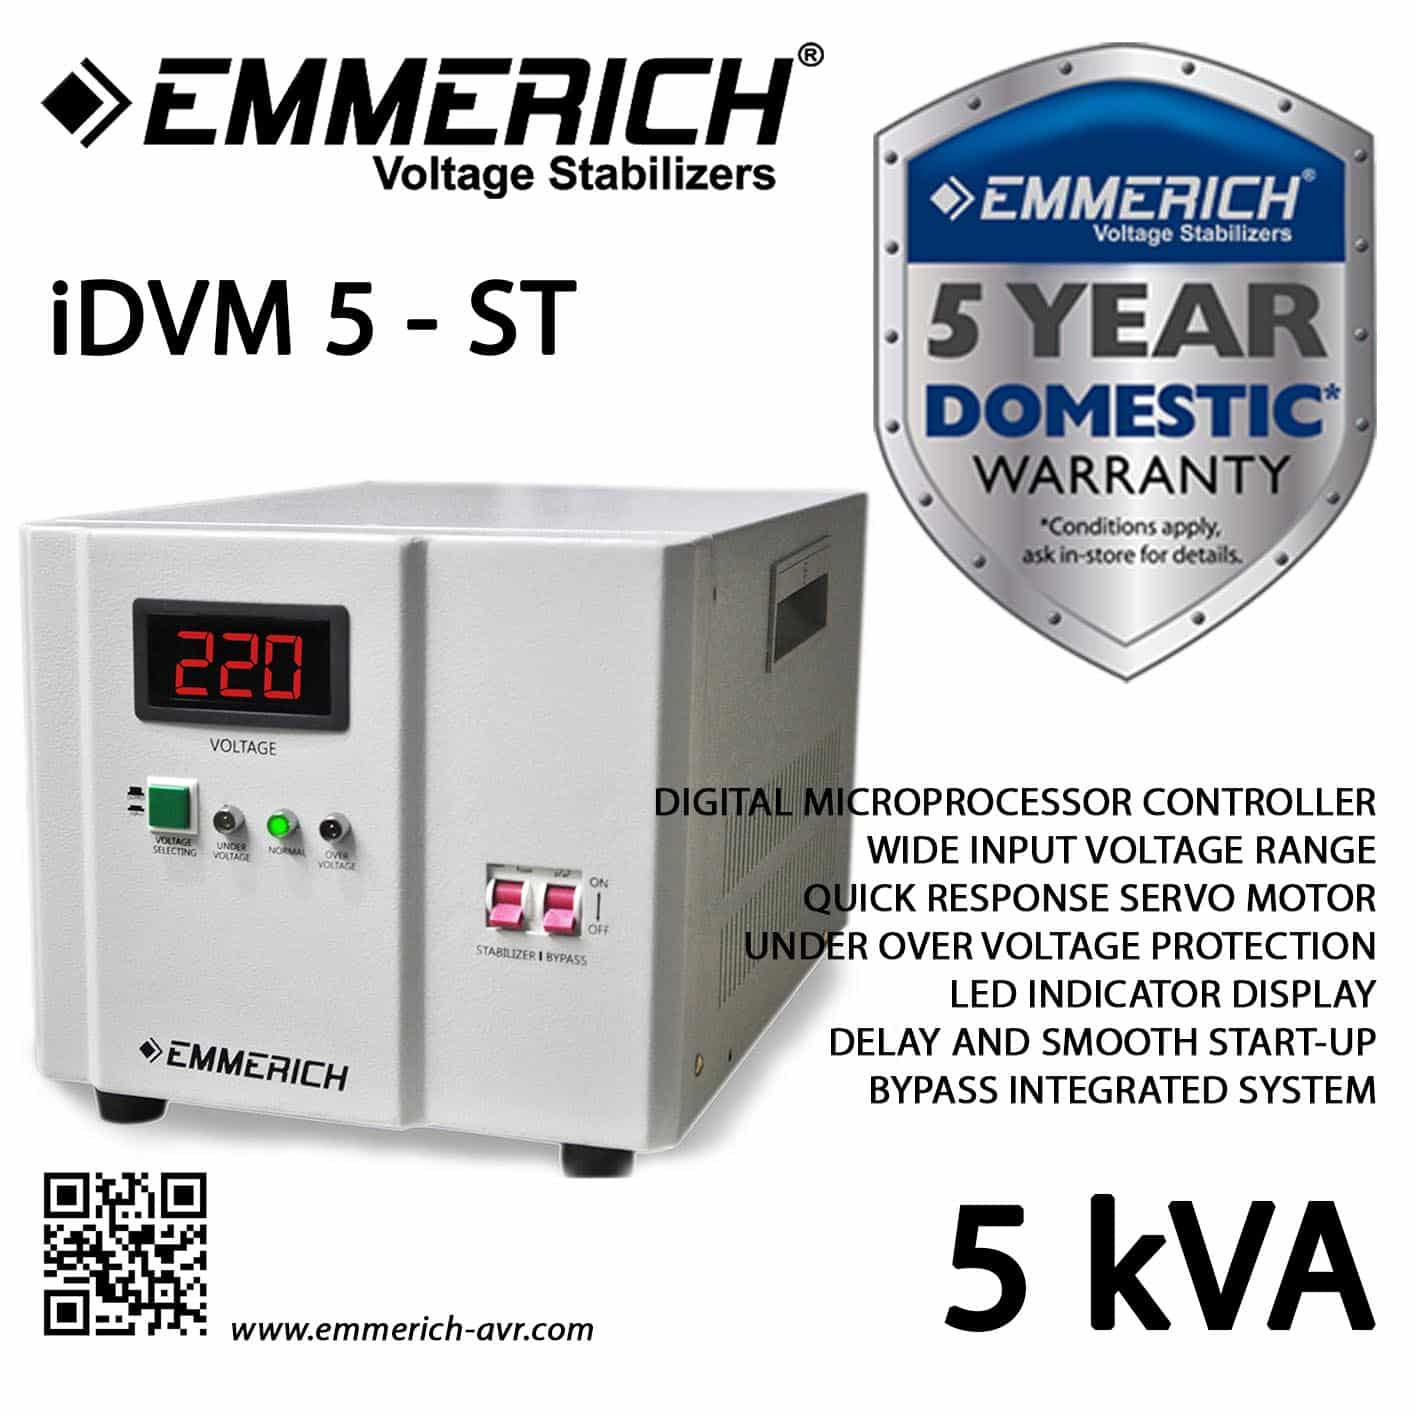 Emmerich-5KVA-IDVM-5-5-ST